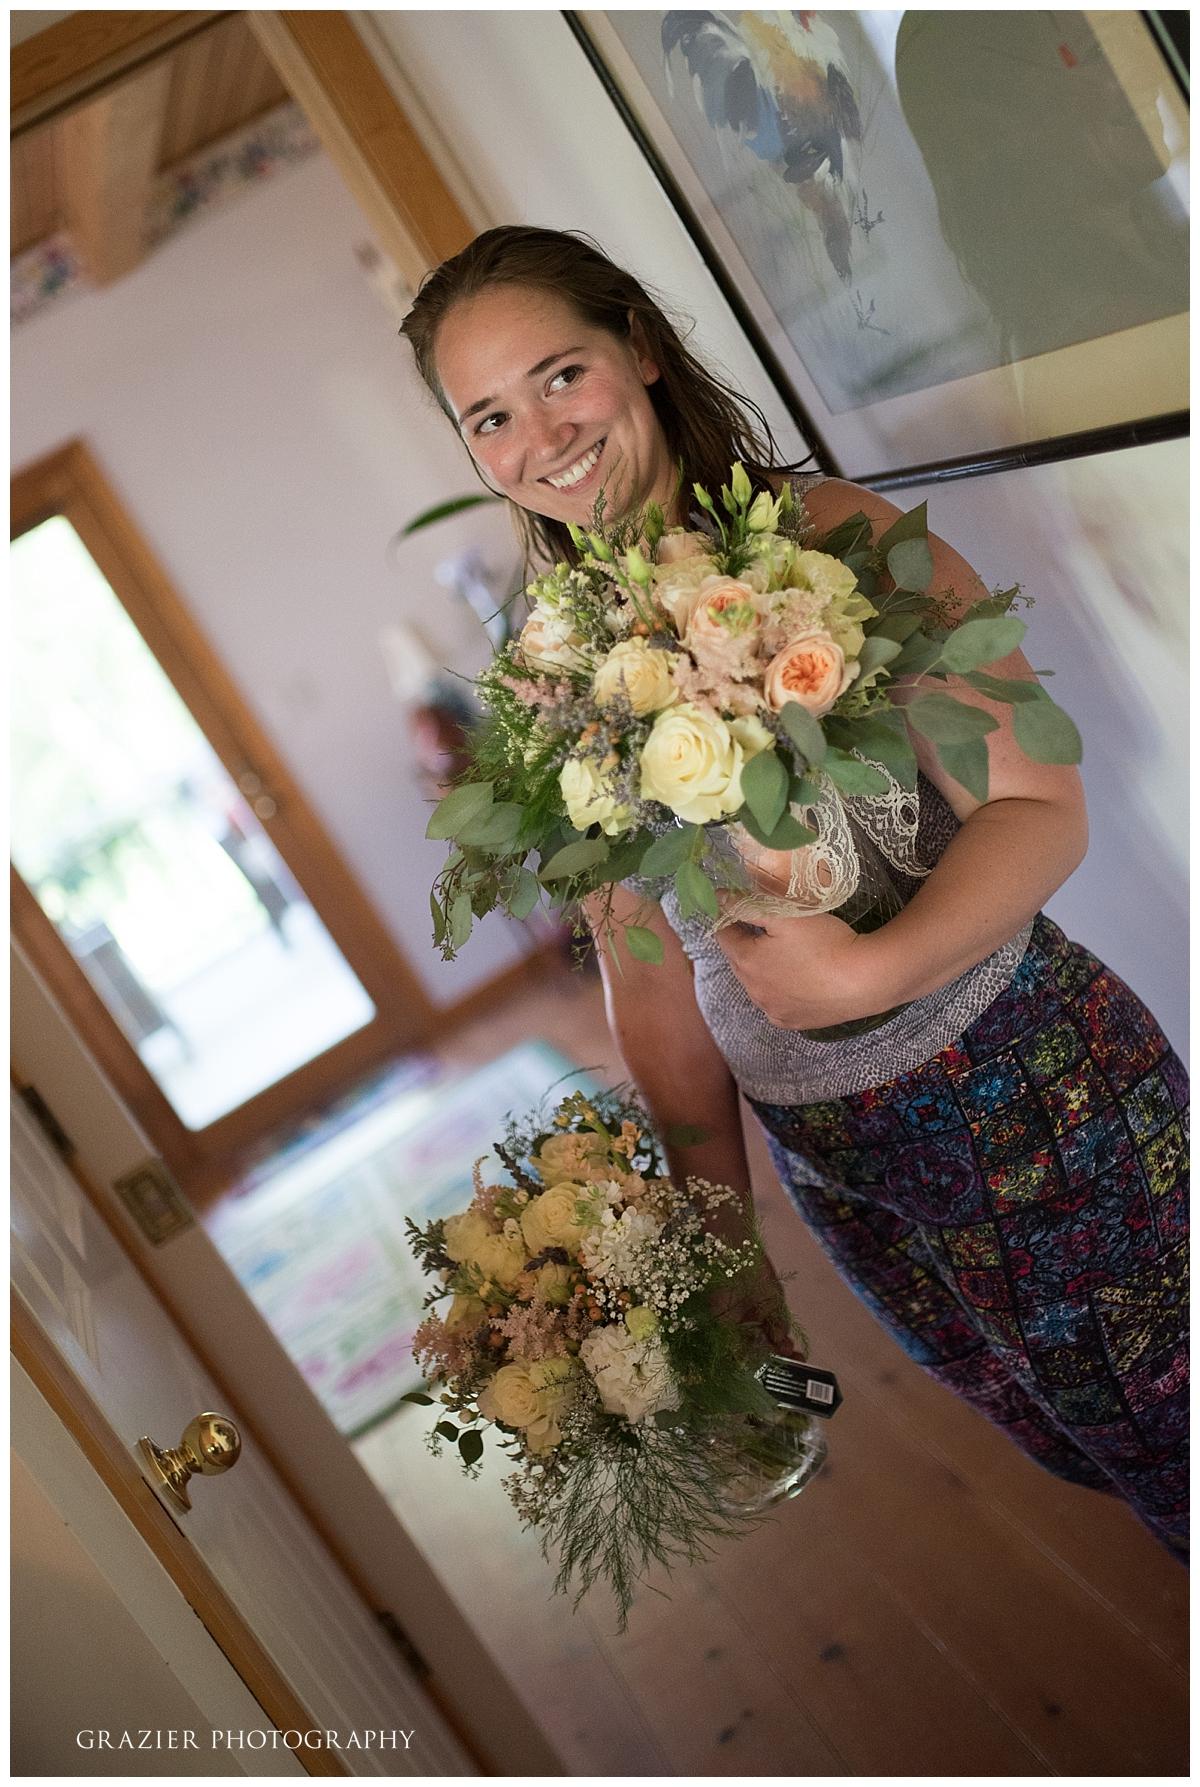 Tyrone Farm Wedding Grazier Photography 2017-18_WEB.jpg